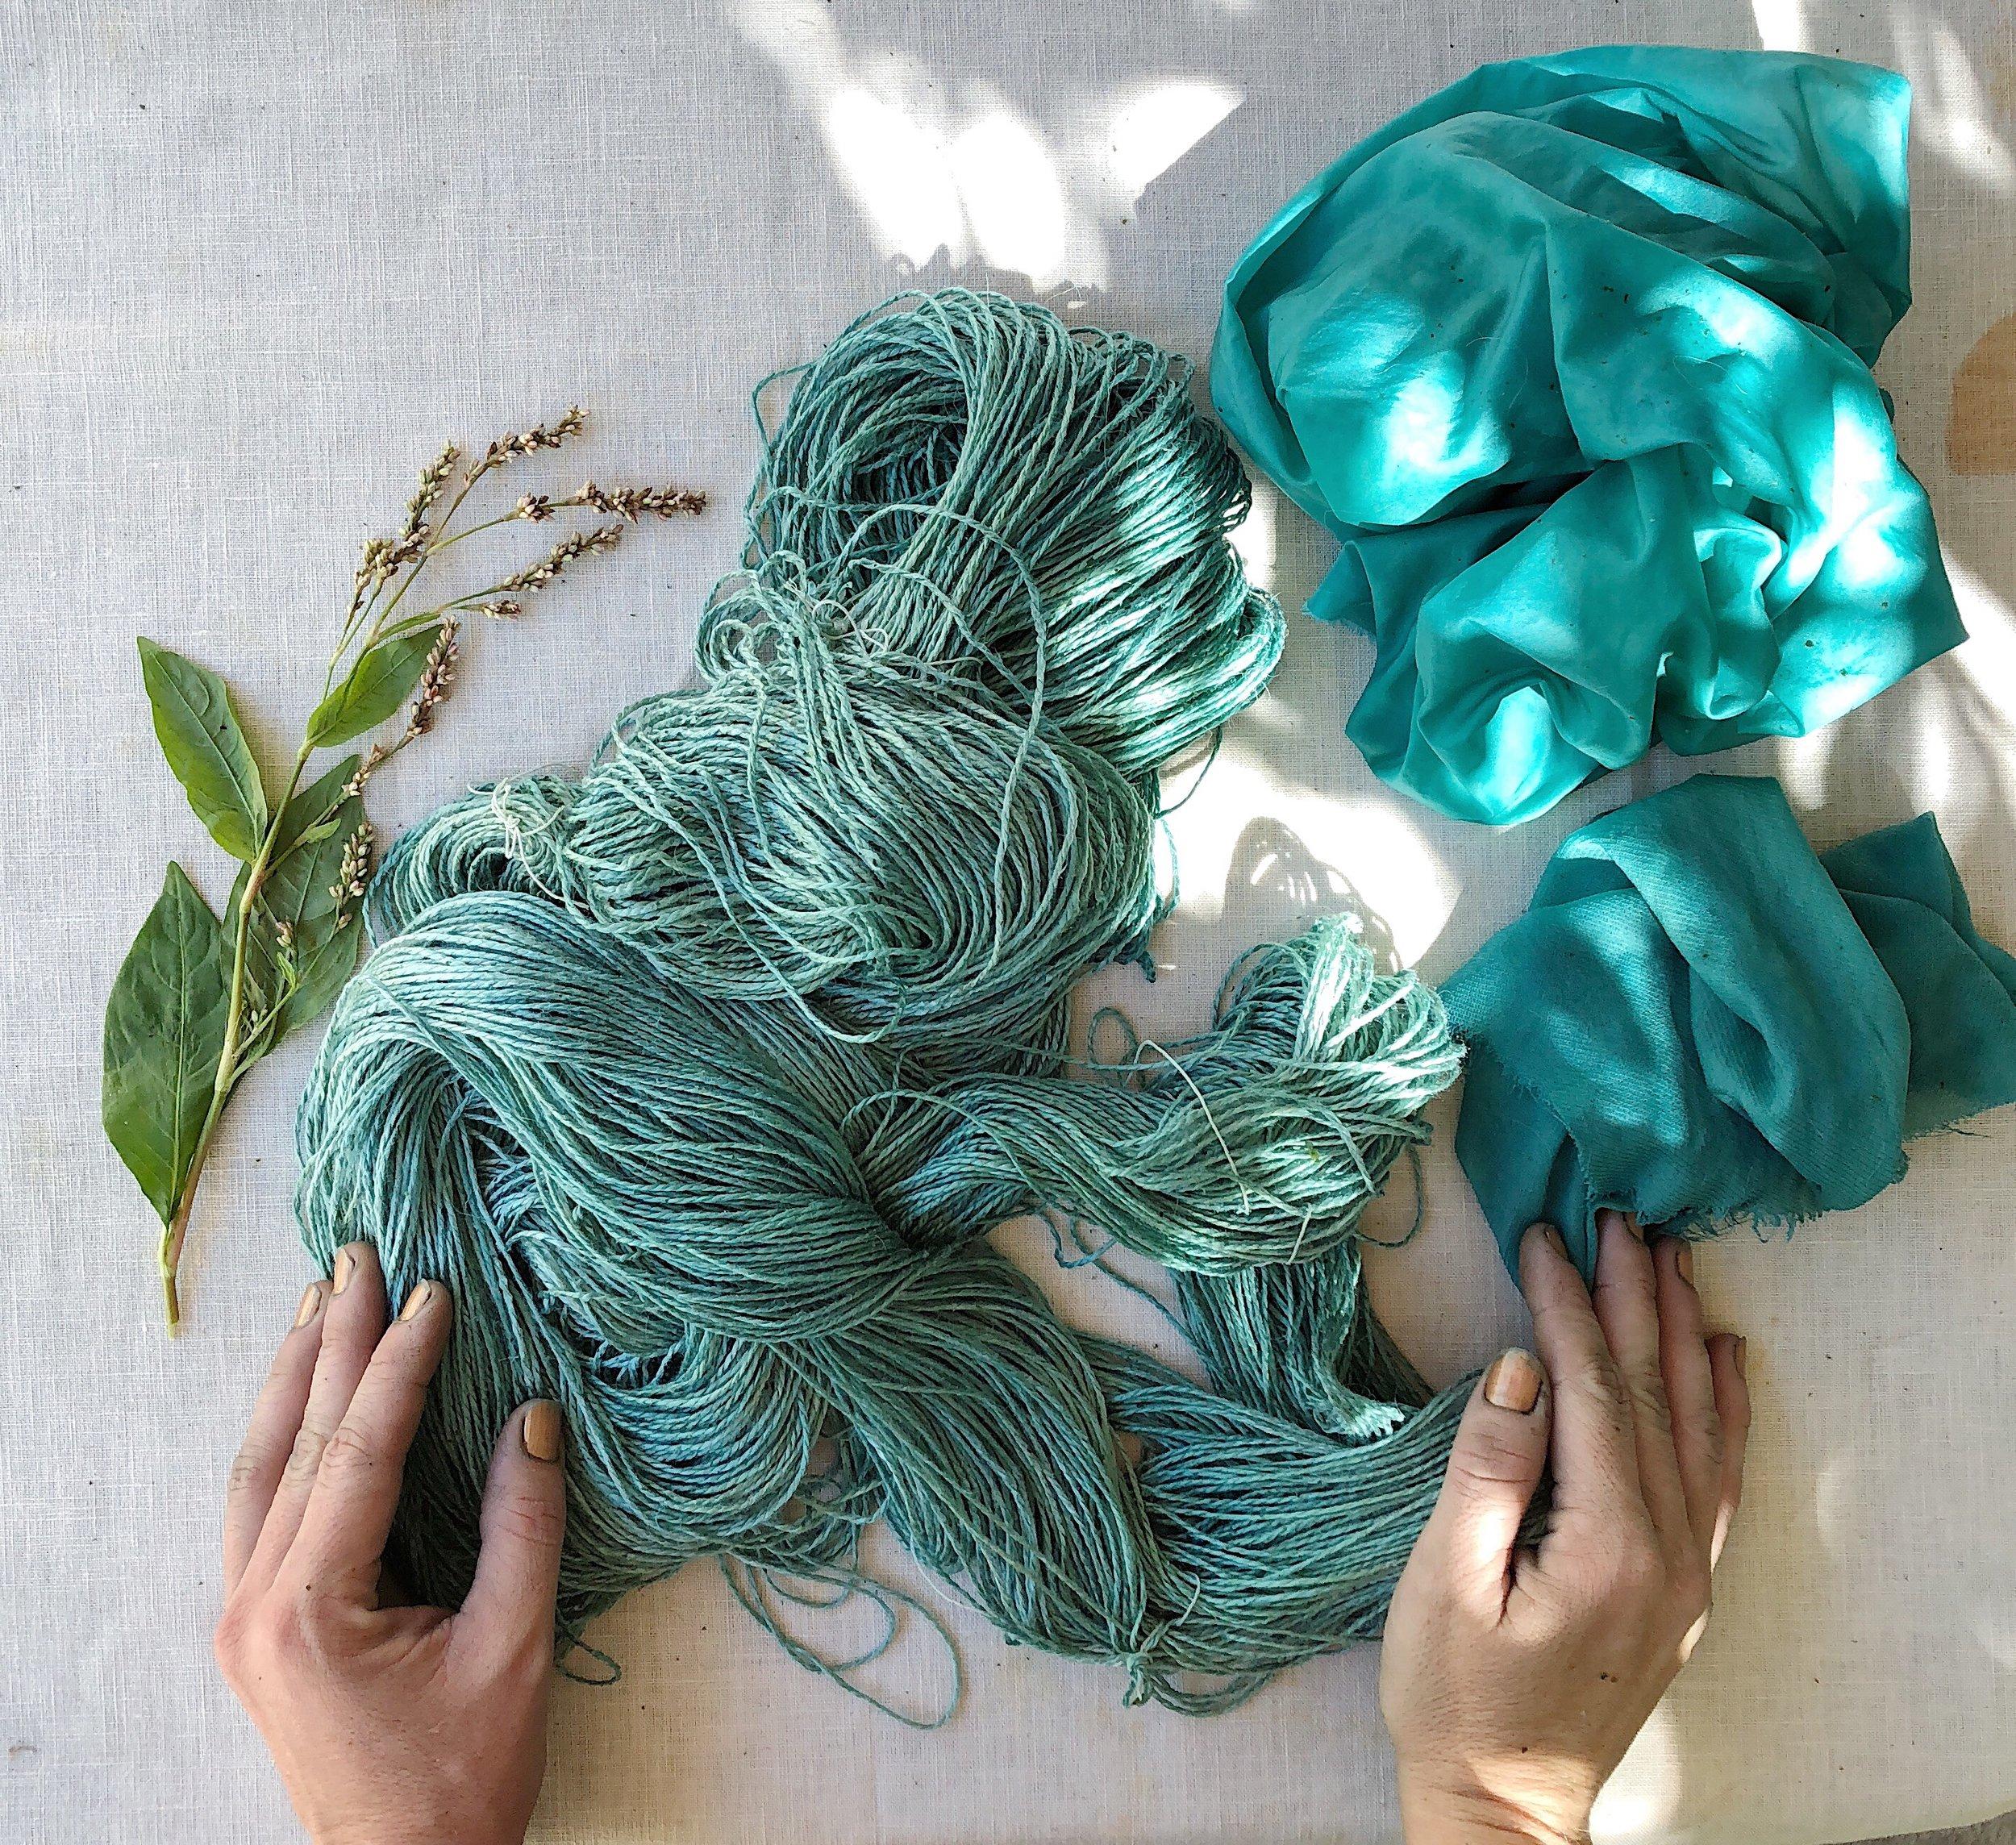 garden hands, fresh leaf indigo dye on silk yarn & fabric from my garden in october 2018